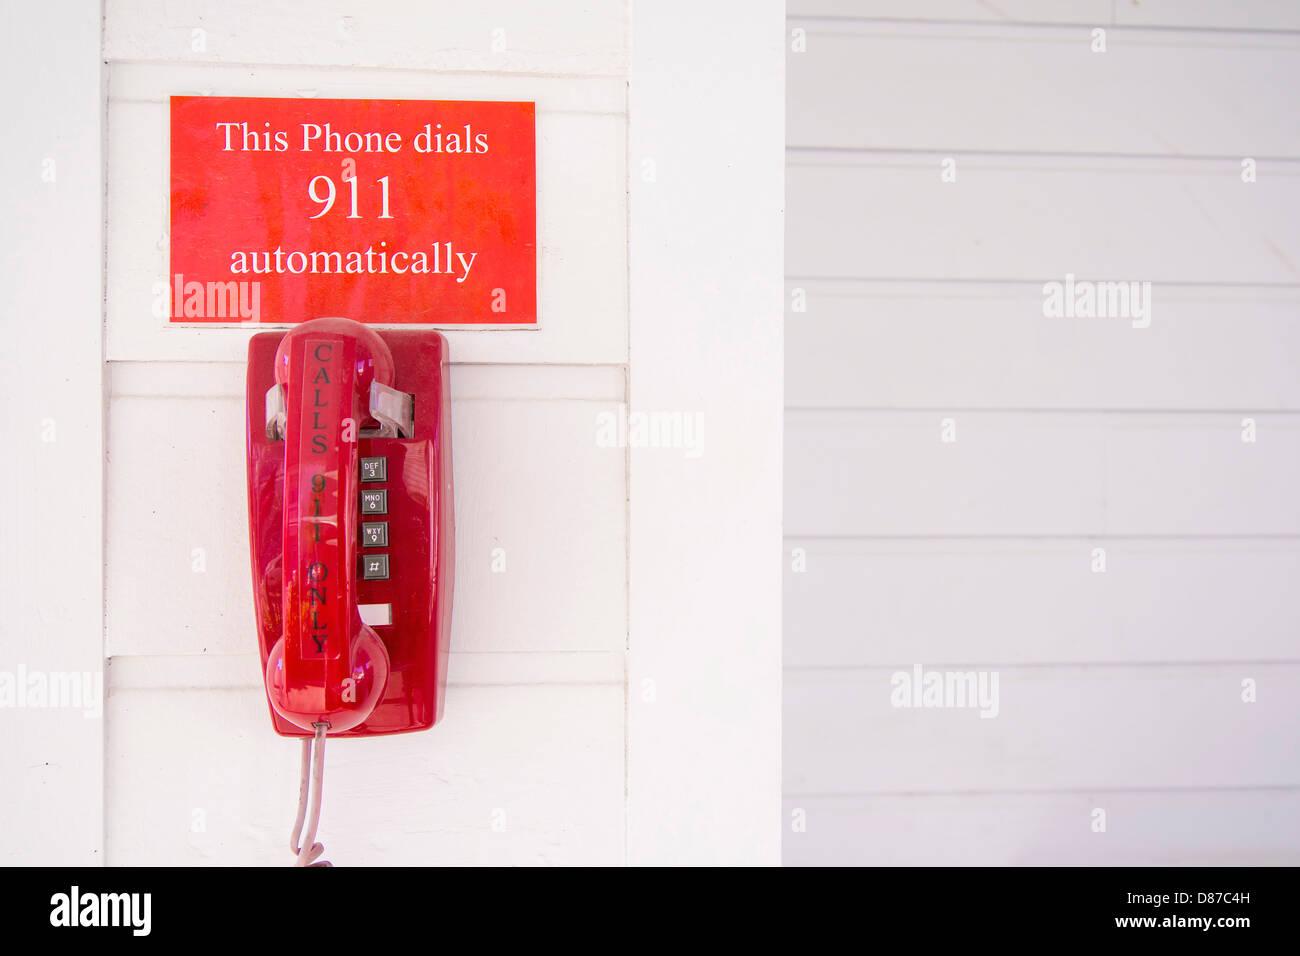 Designated red 911 emergency telehone - Stock Image